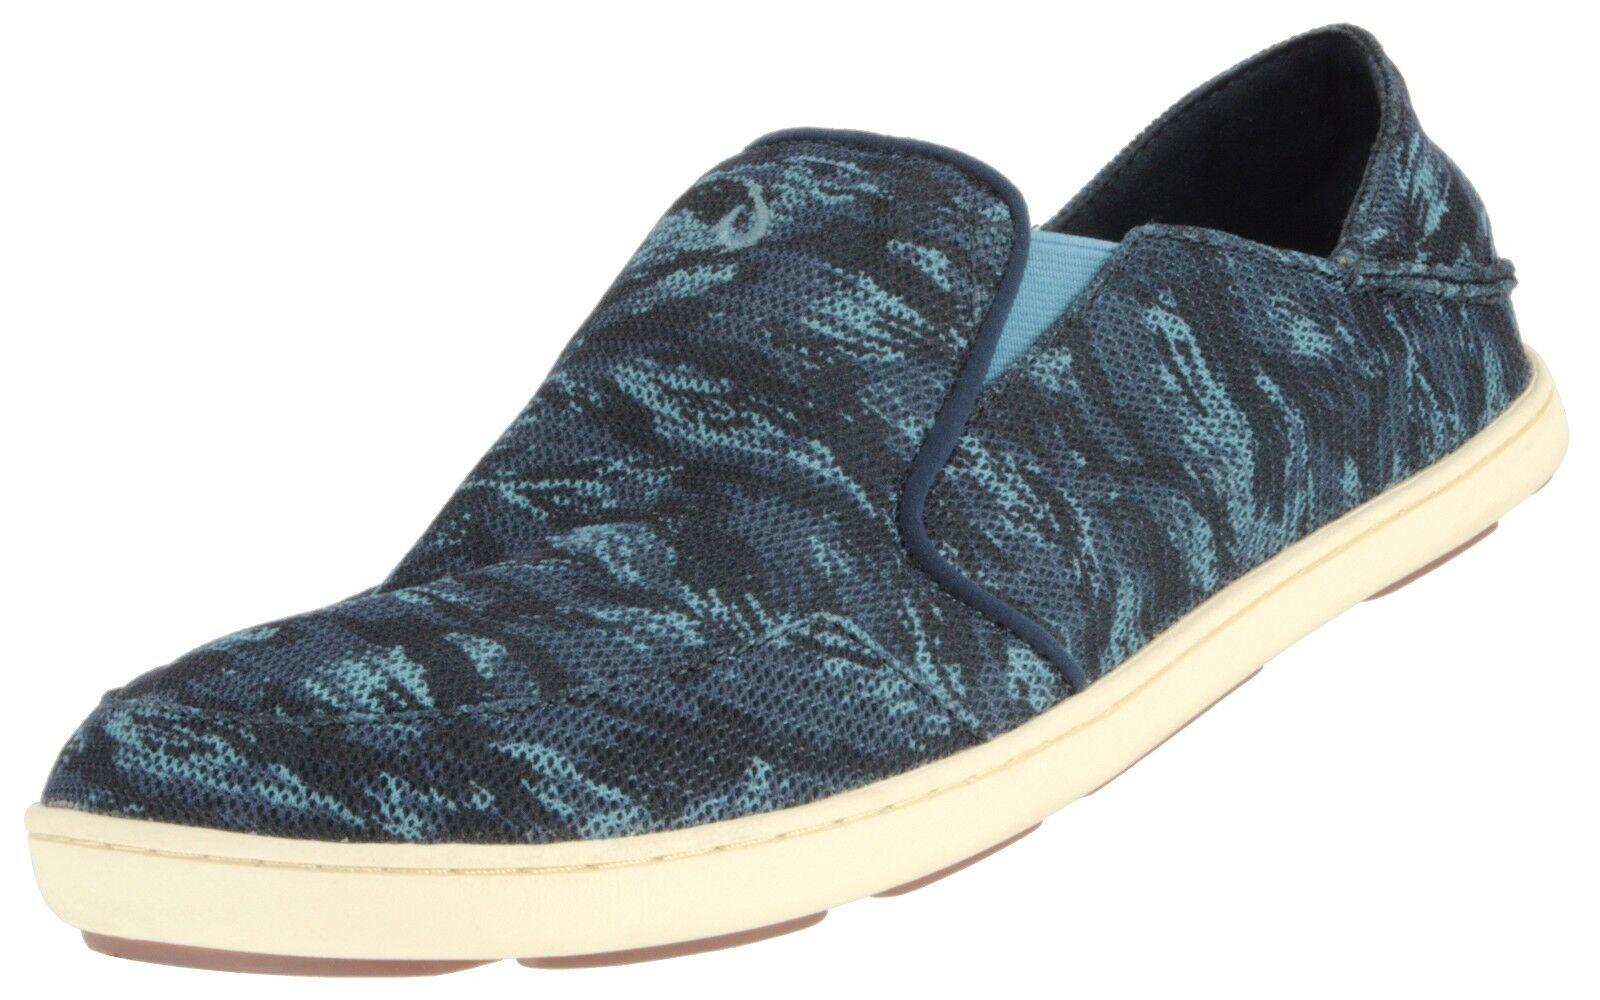 OLUKAI SAMPLE MESH 10188 MEN'S NOHEA  MESH SAMPLE SLIP ON SNEAKER Schuhe SLIDES  US 10 EU 43 0ce40f